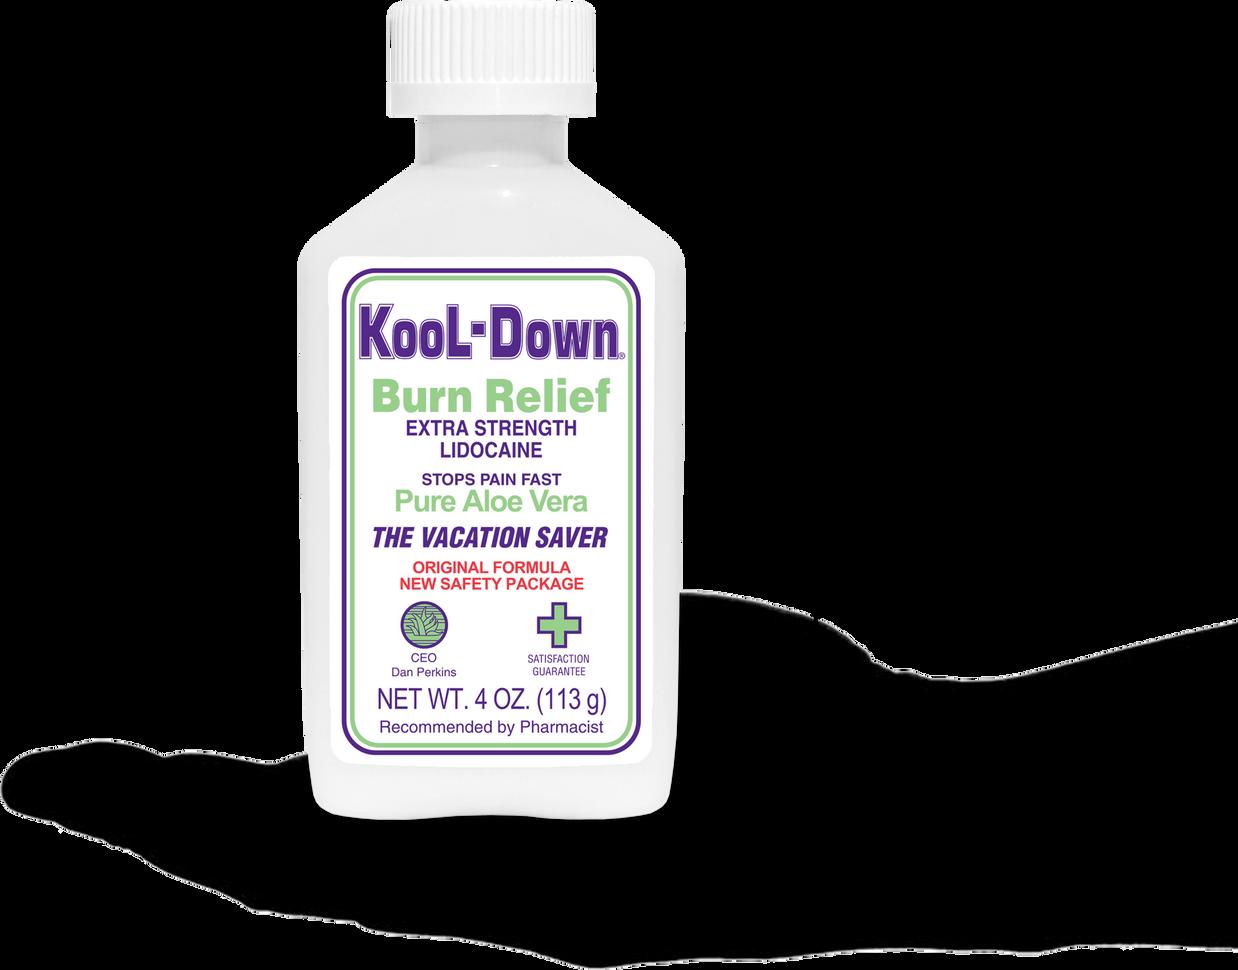 kool-down-hand.png